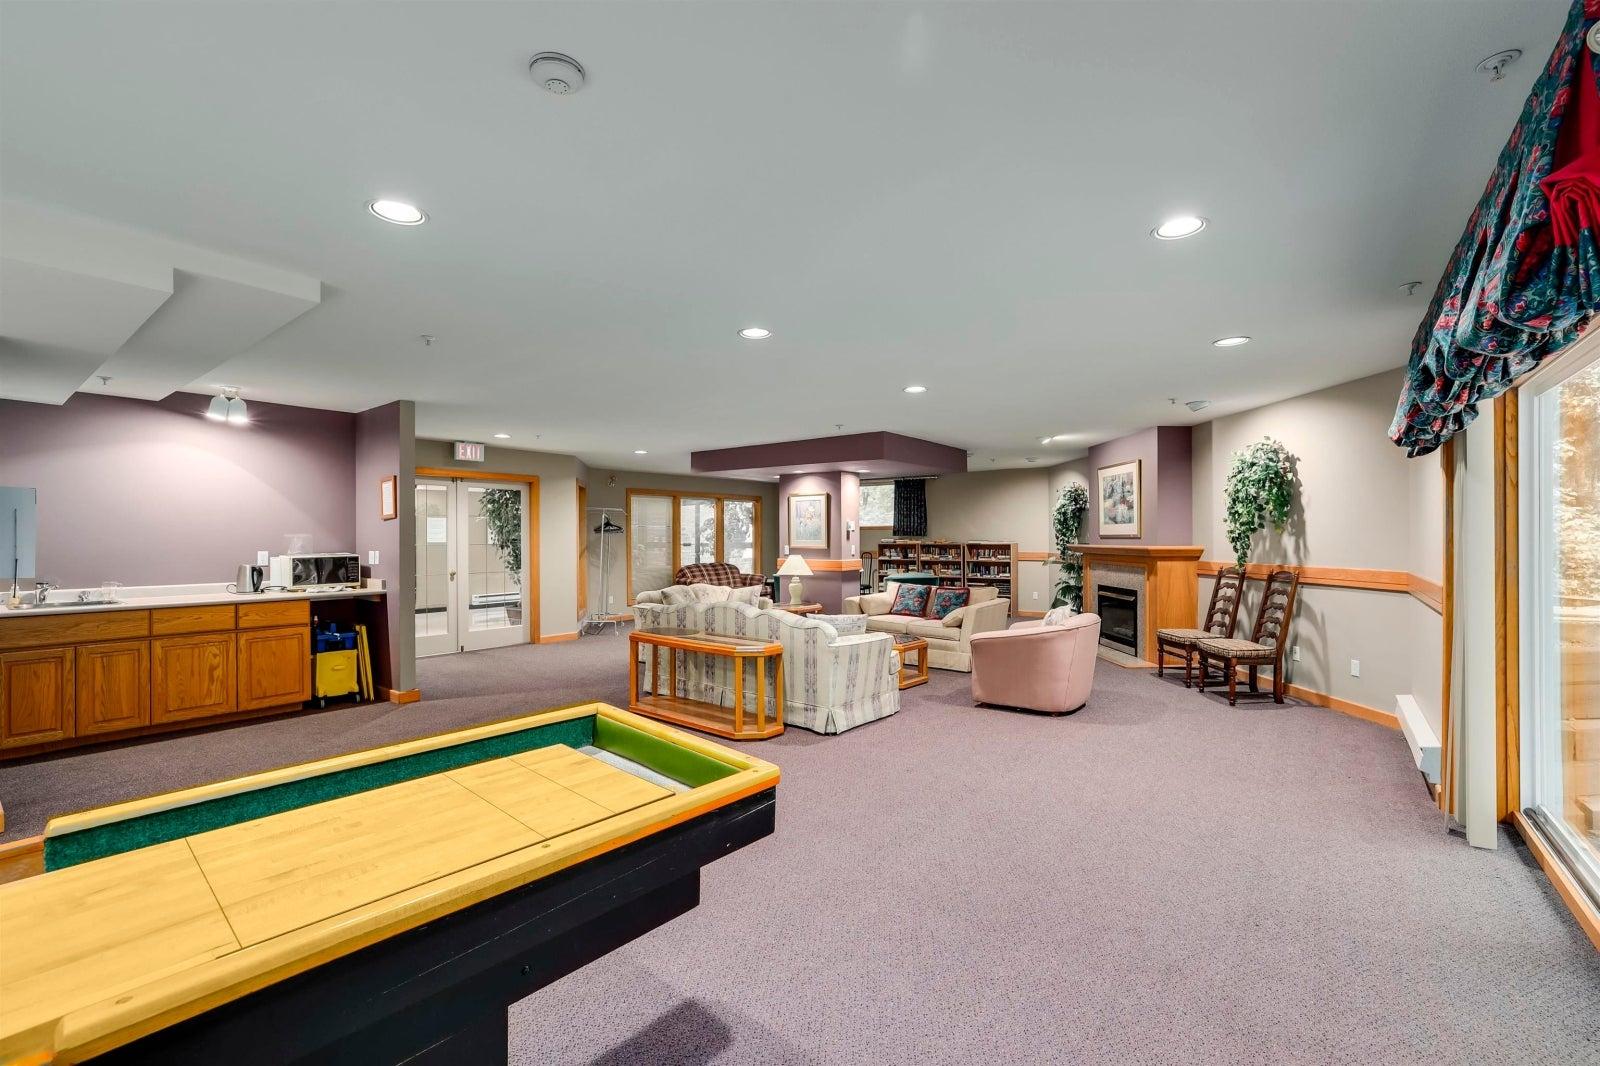 103 1132 DUFFERIN STREET - Eagle Ridge CQ Apartment/Condo for sale, 2 Bedrooms (R2618654) #22